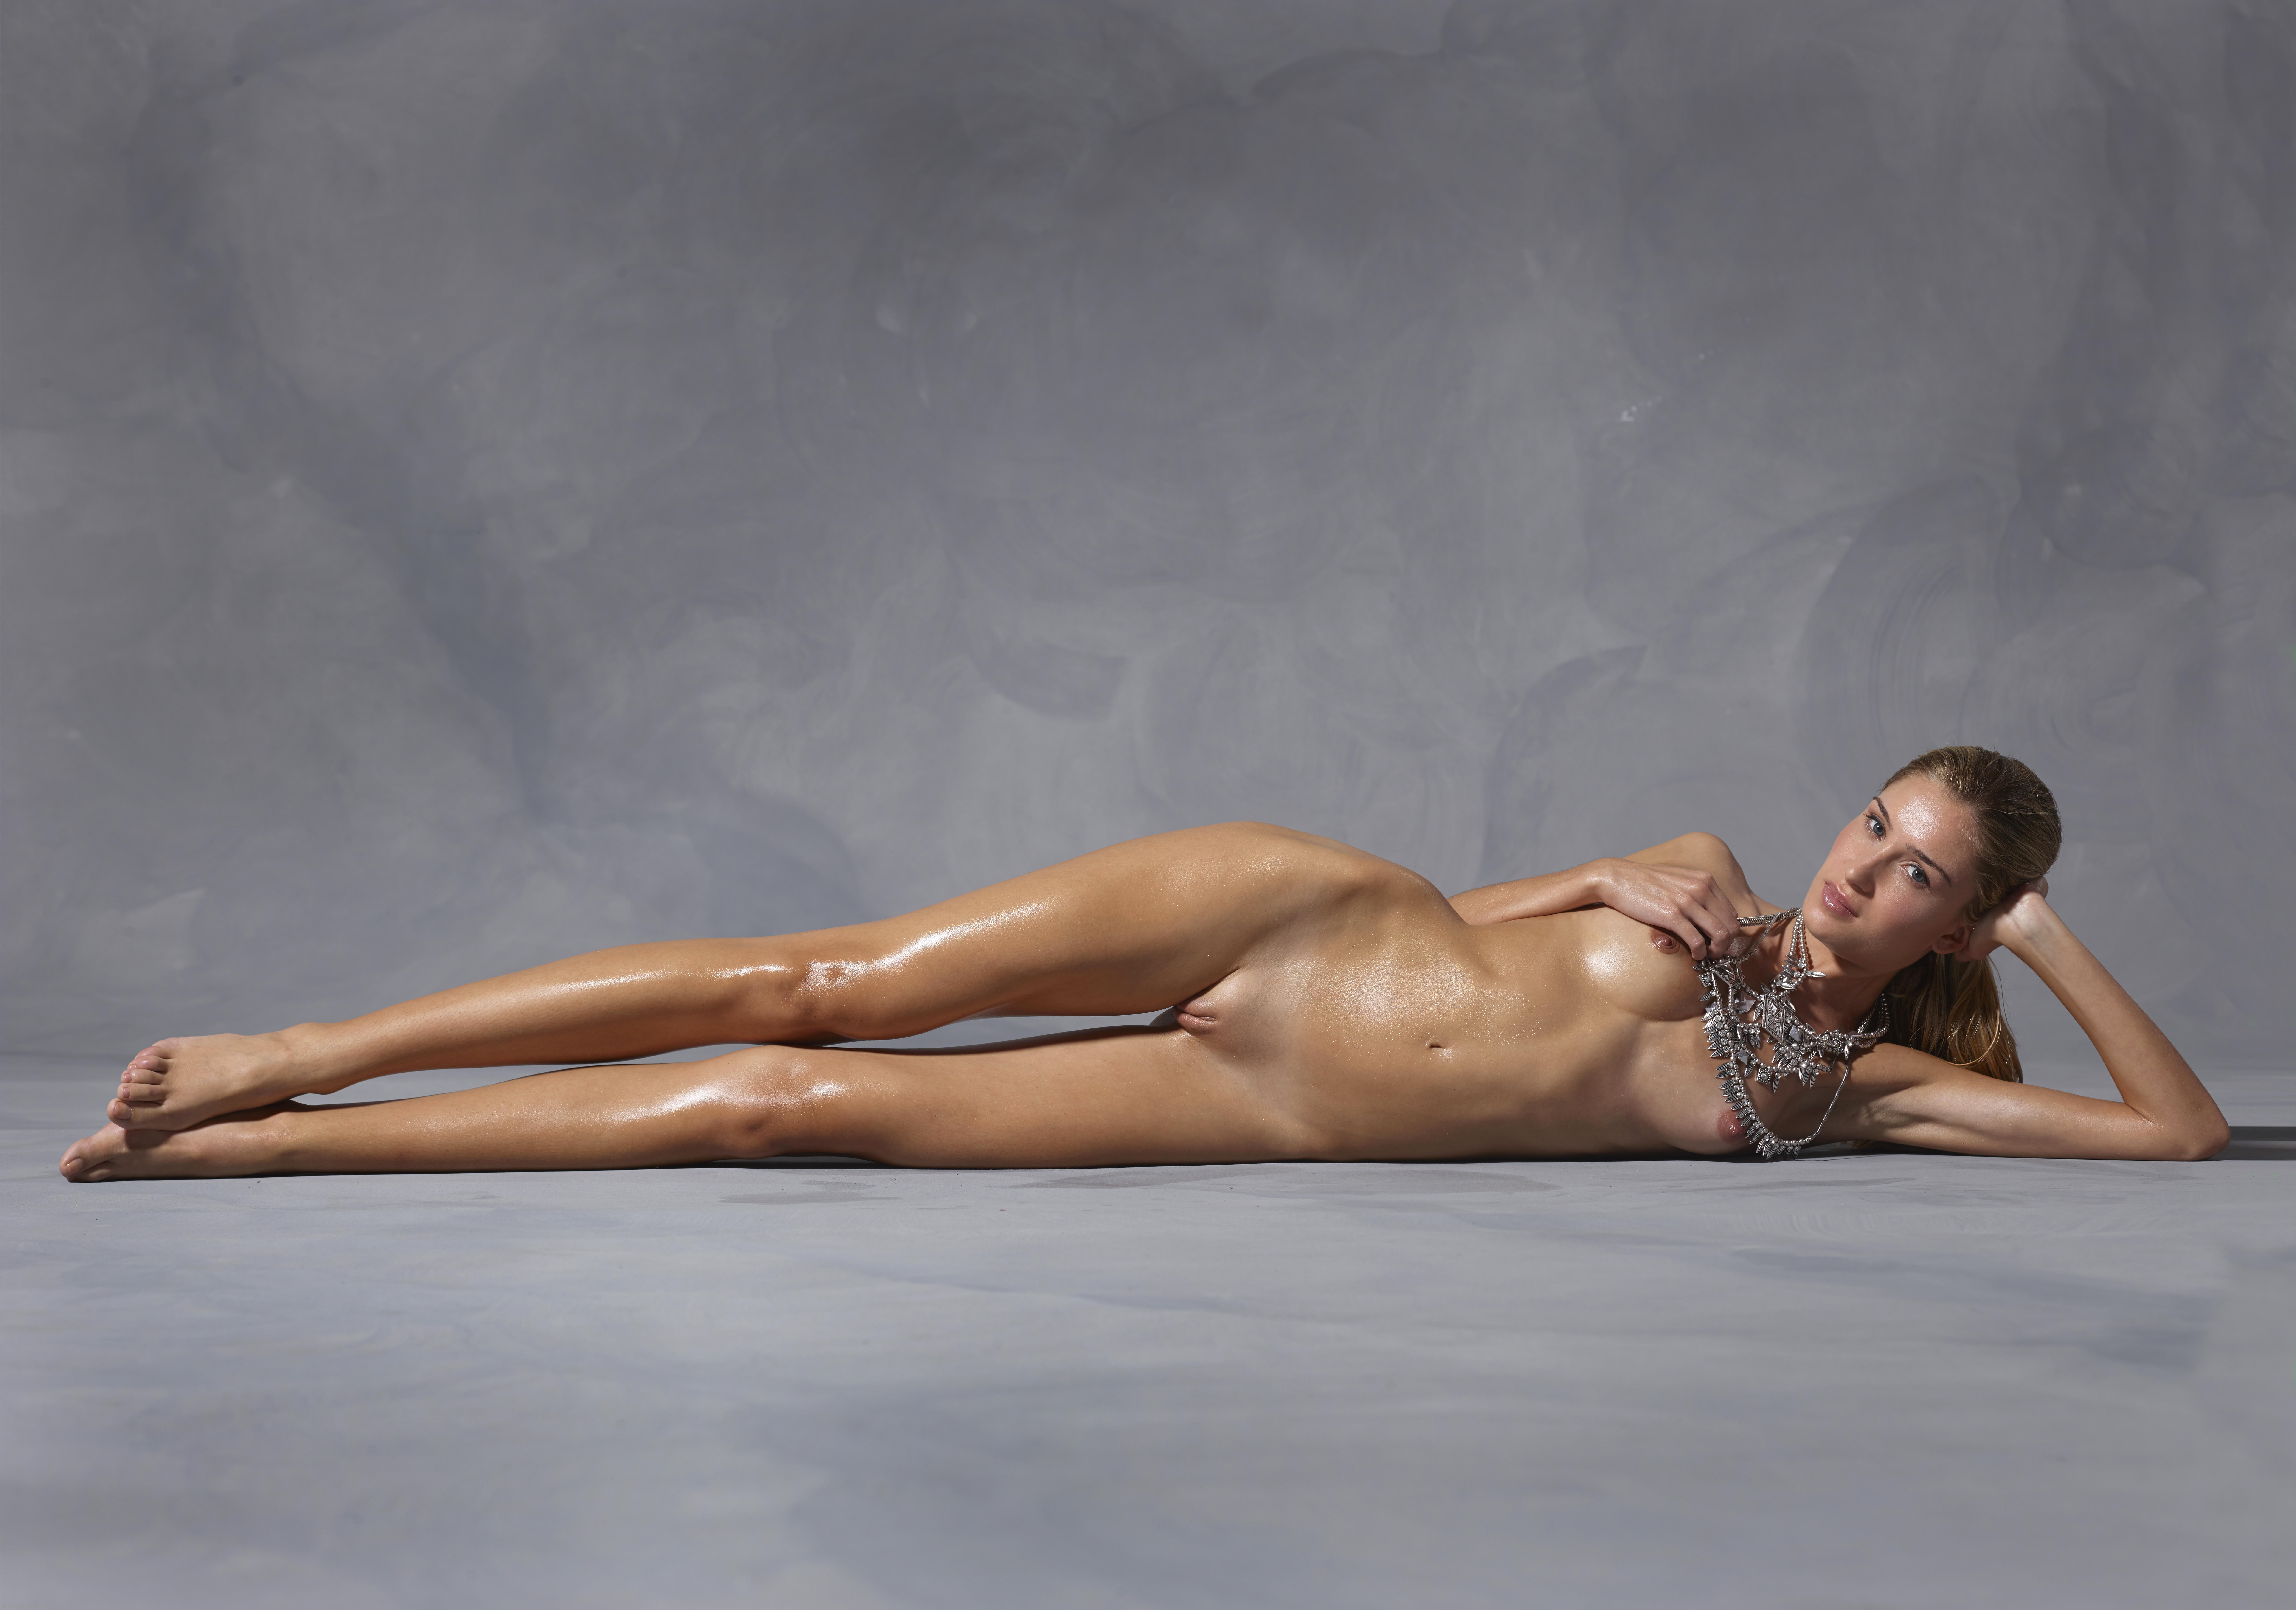 High resolution nude photos